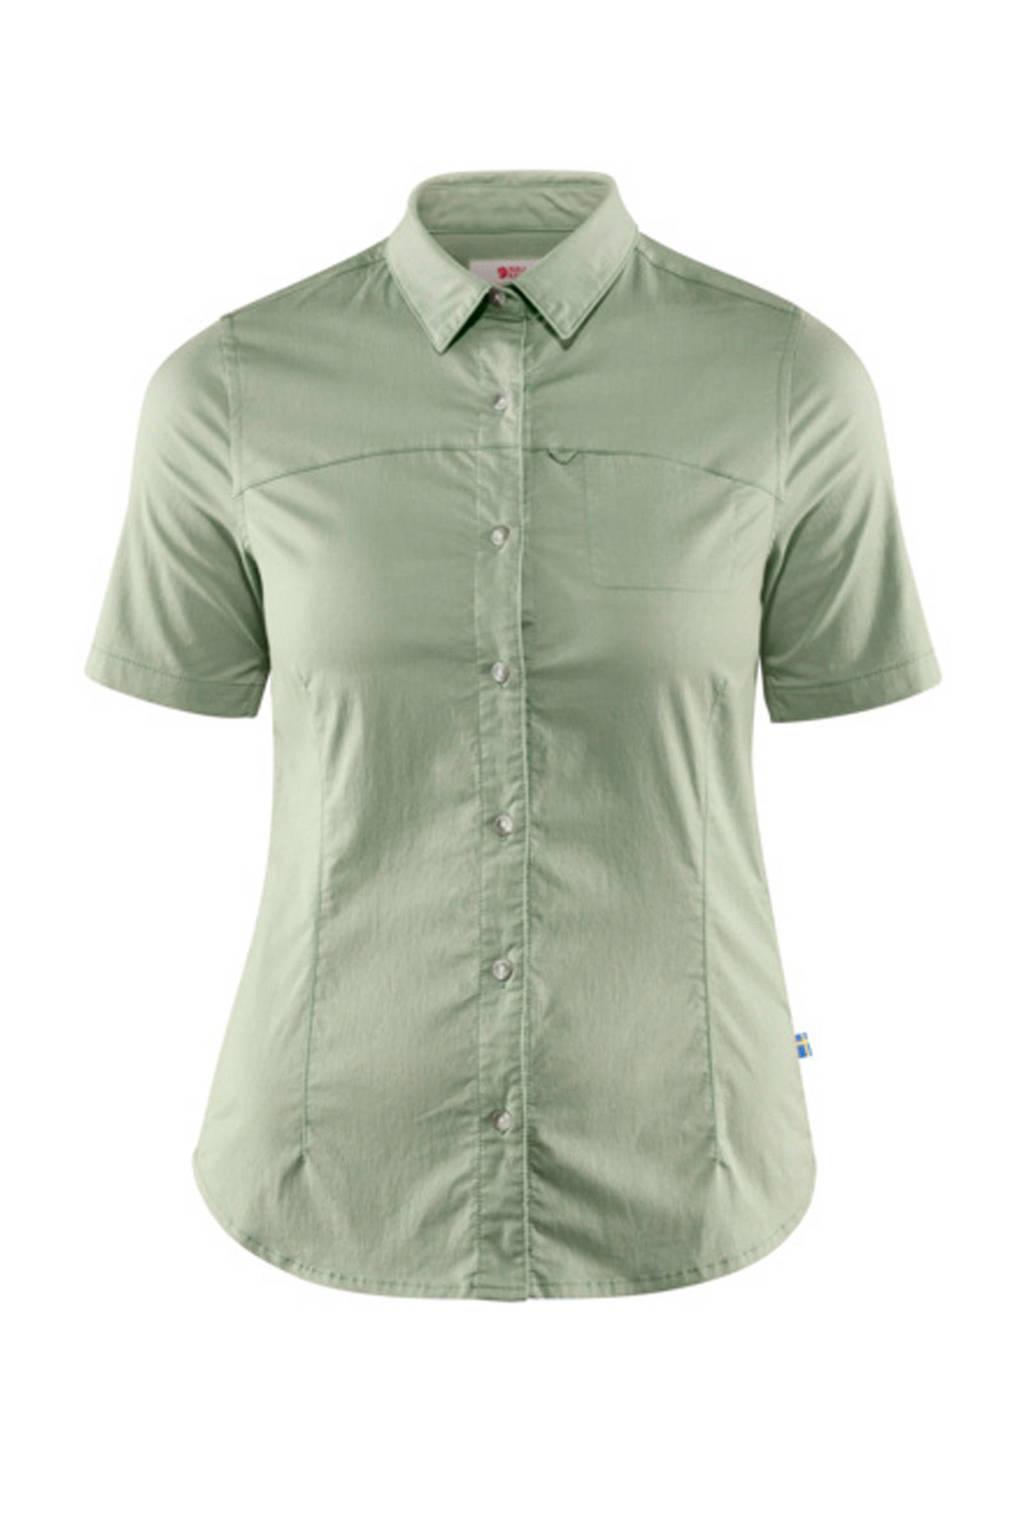 Fjällräven outdoor blouse High Coast Stretch groen, Sage Green